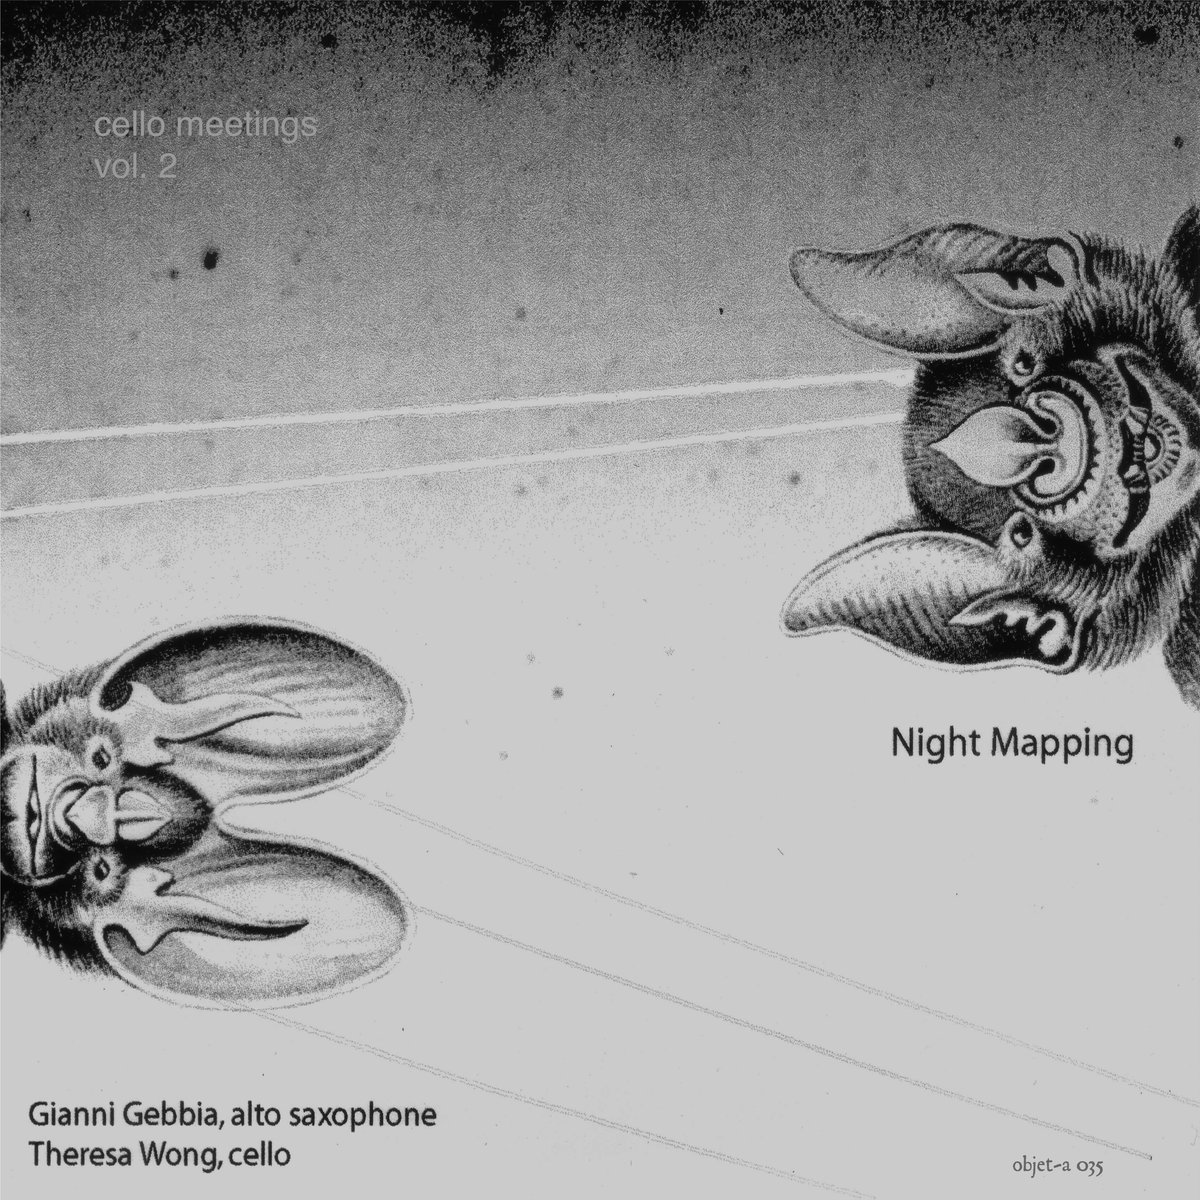 Night Mapping